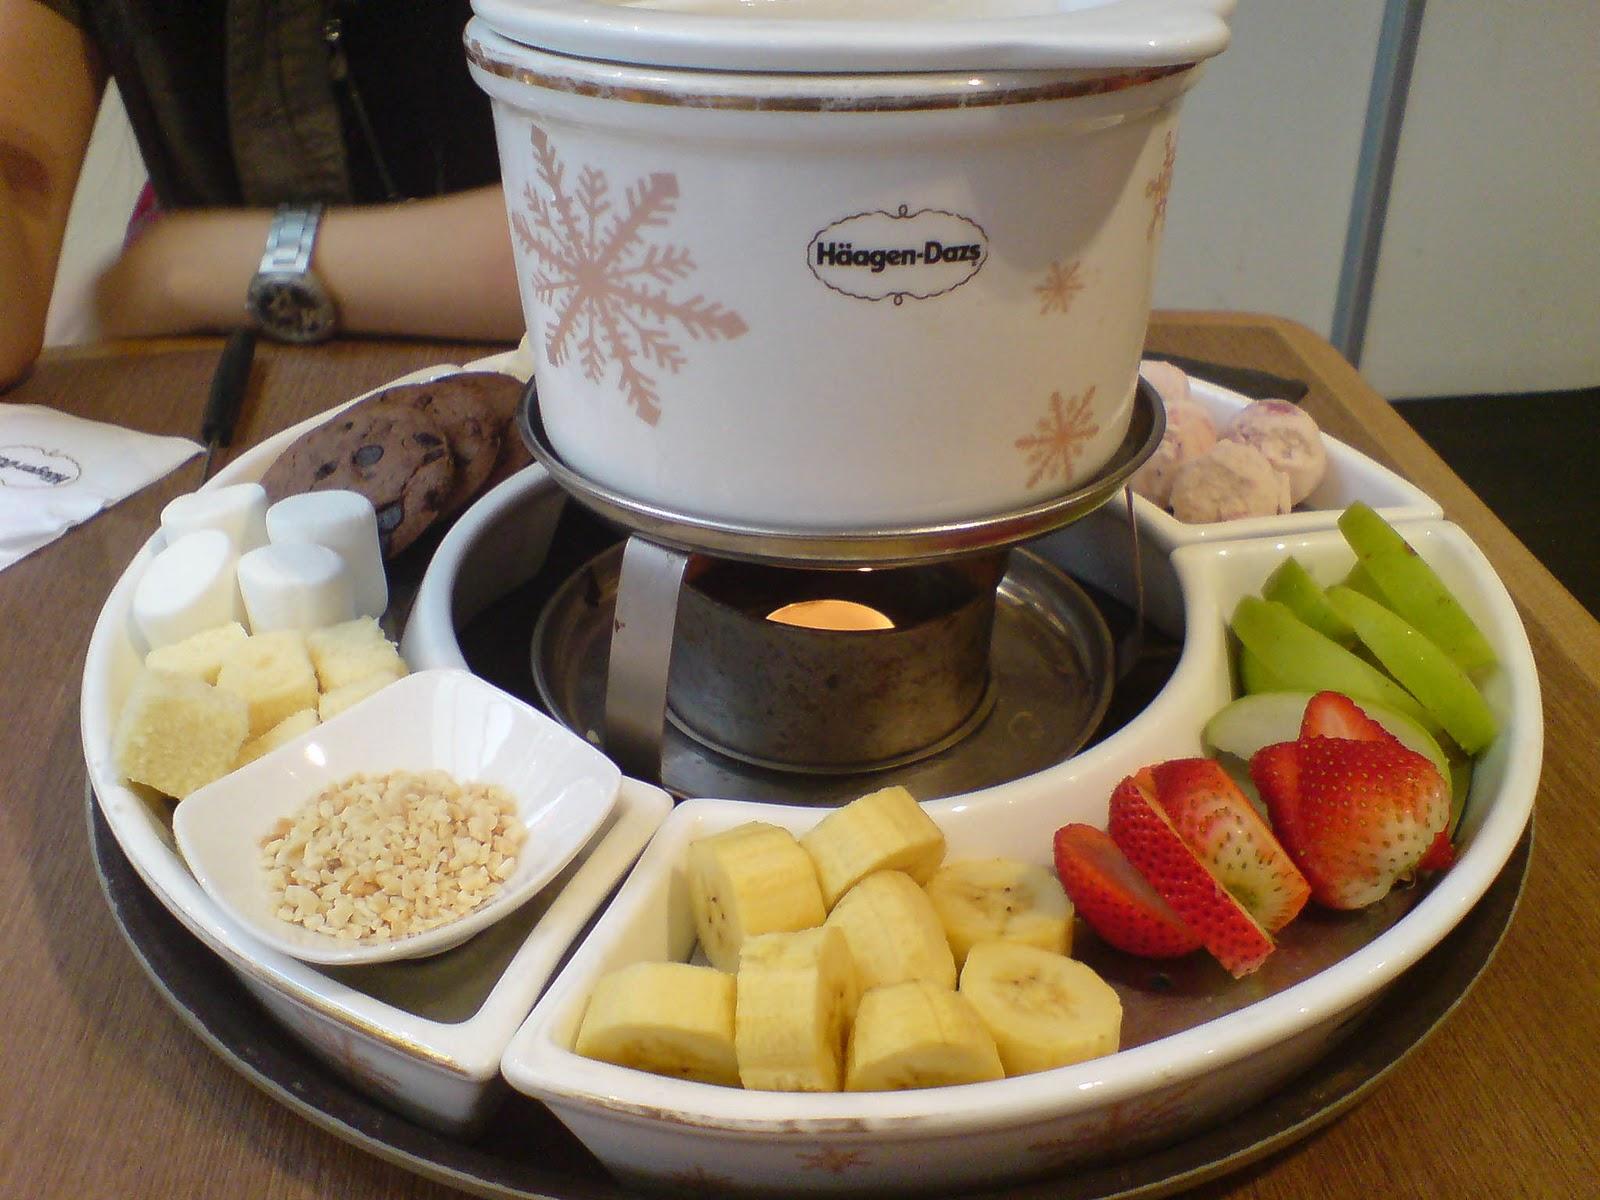 2018 fondue haagen malaysia dazs price BeauteRunway Singapore